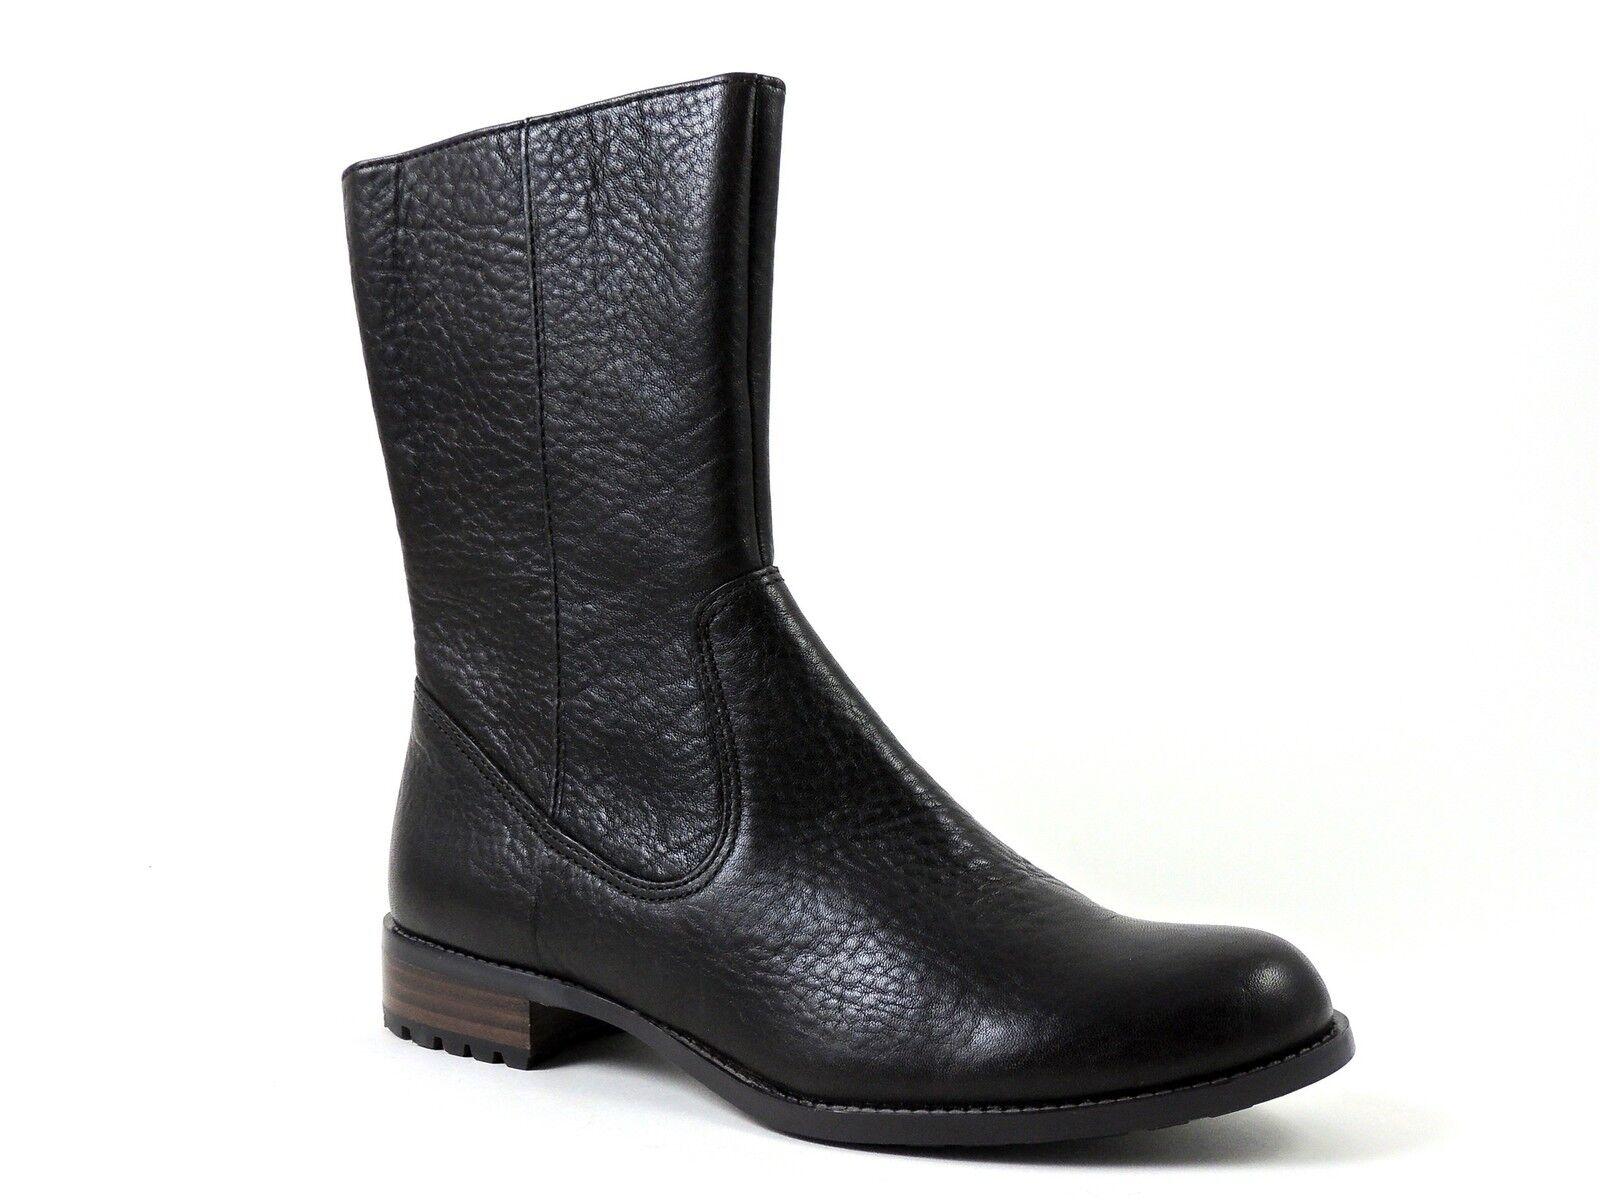 Calvin Klein Women's Terra Flat Boots Dark Brown Tumbled Leather Size 5 M